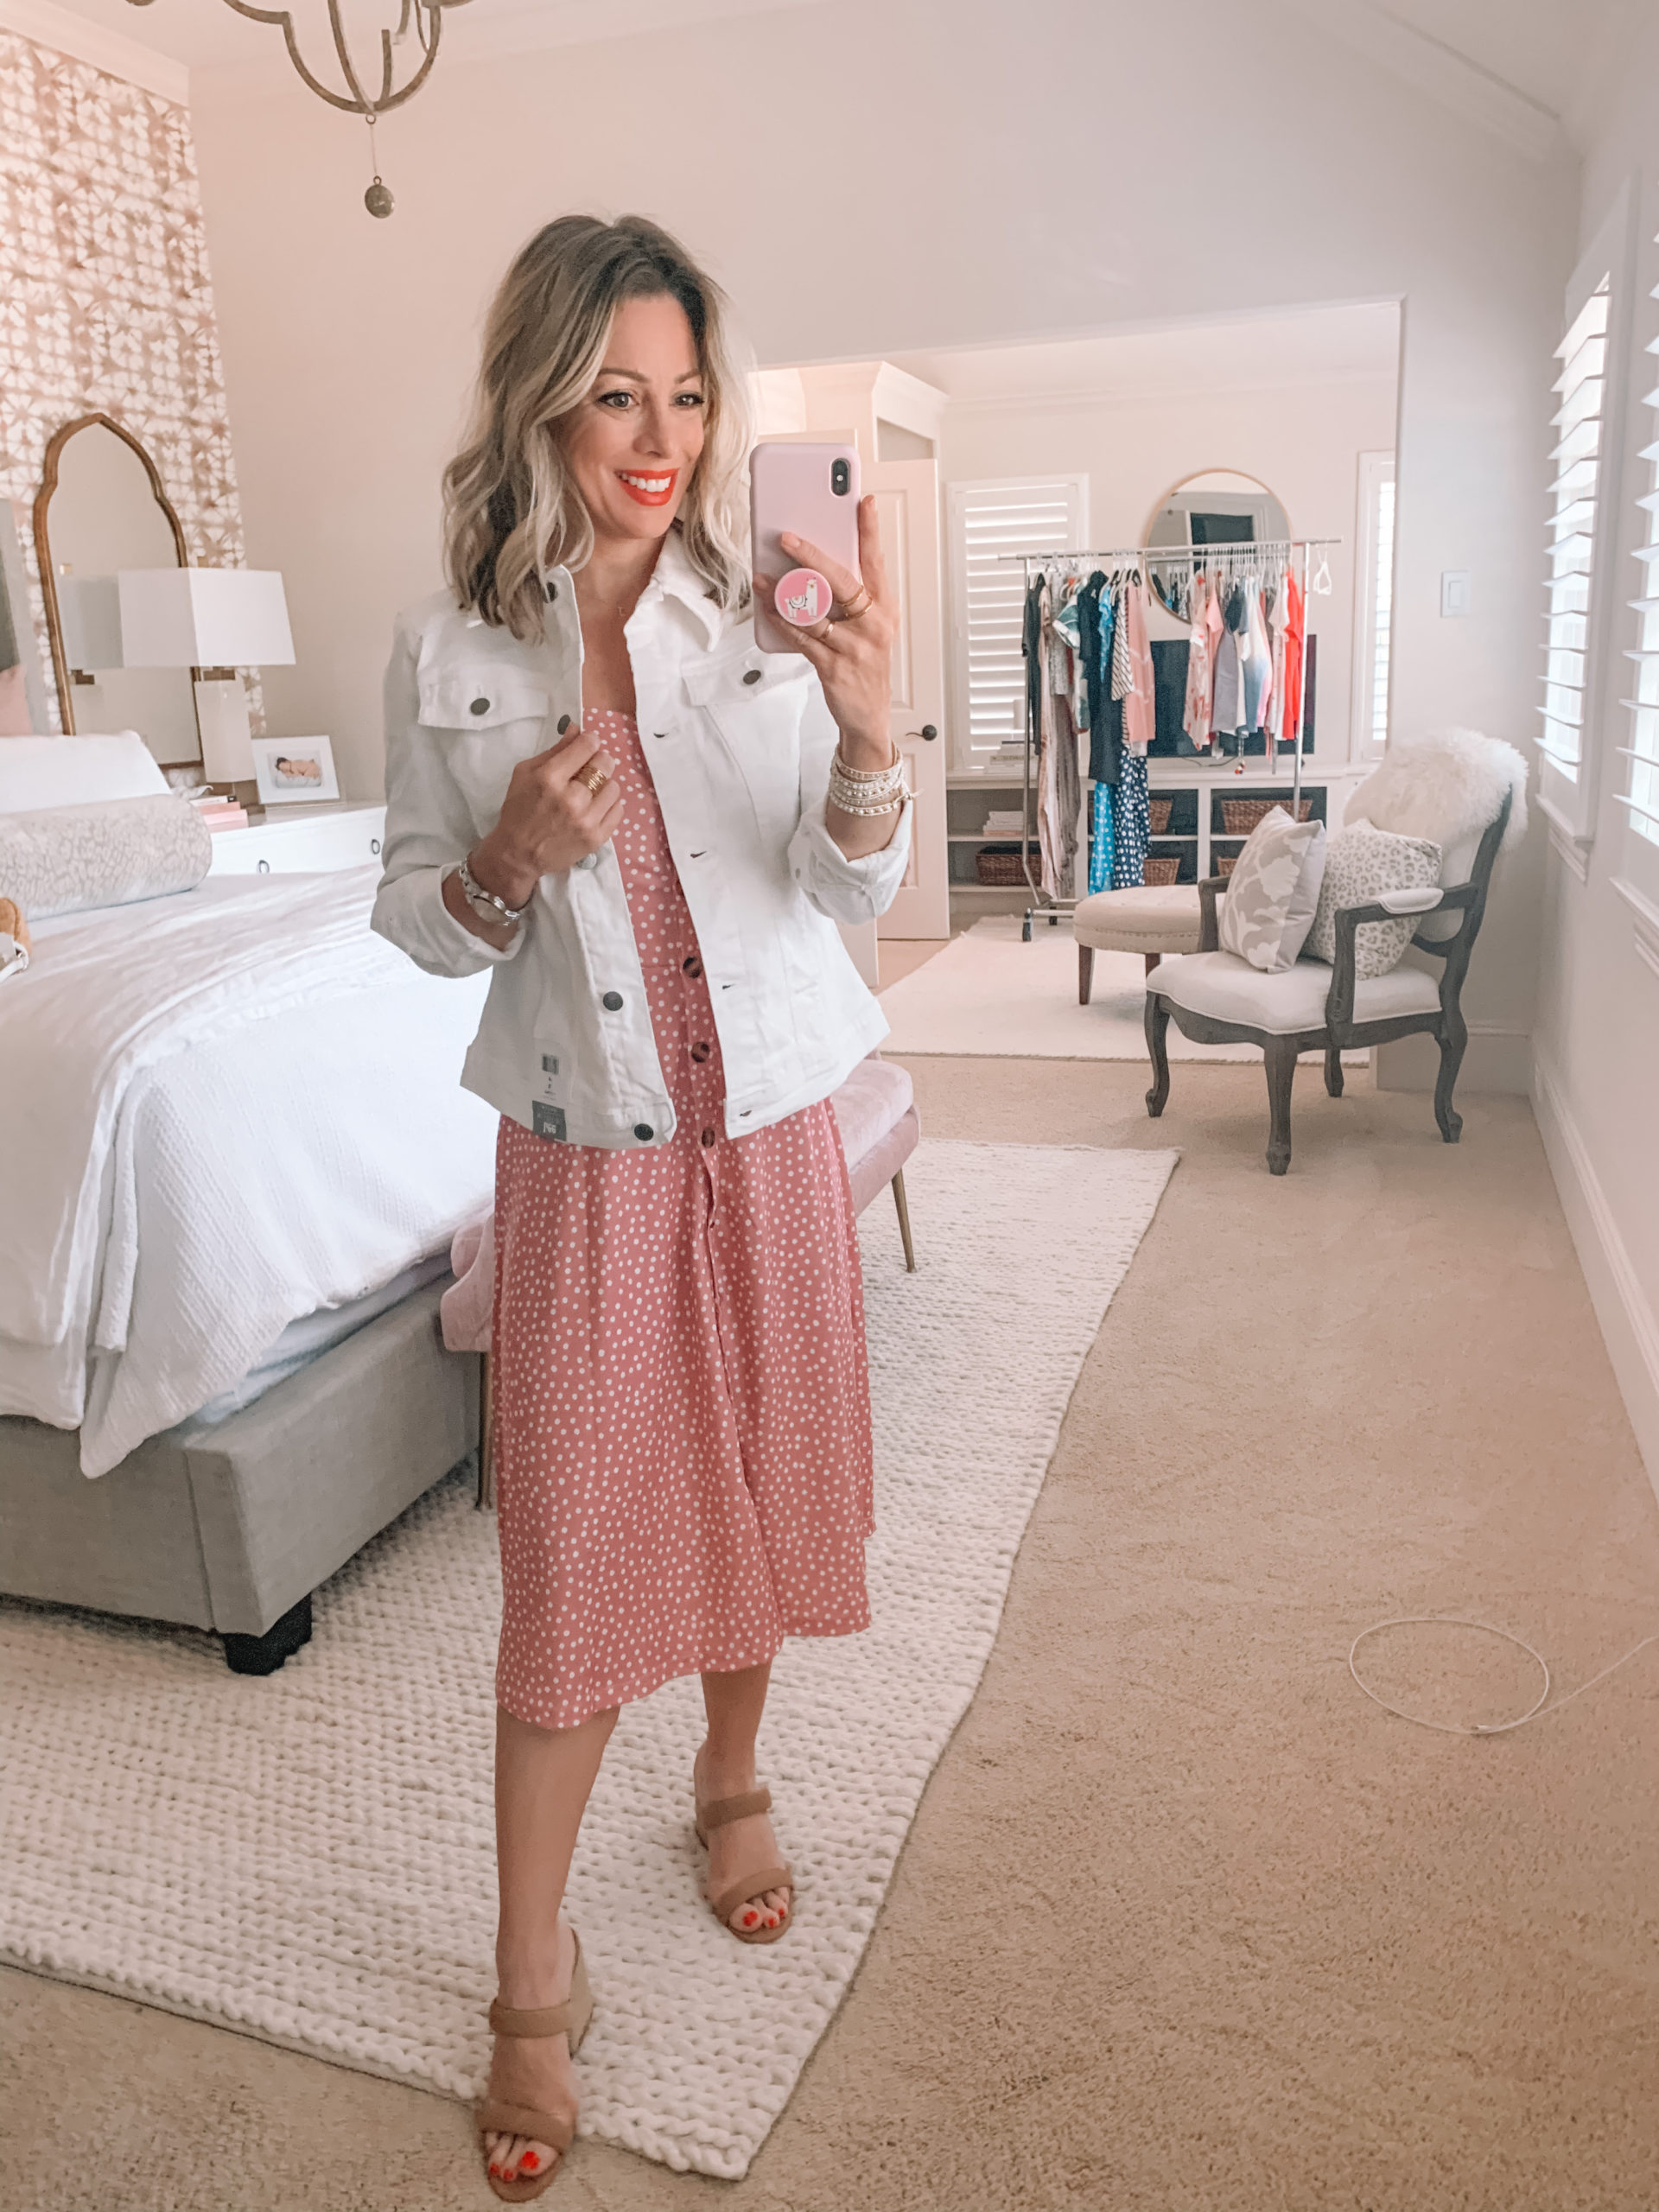 Amazon Fashion - White Denim Jacket, Spaghetti Strap Midi Dress, Wedges